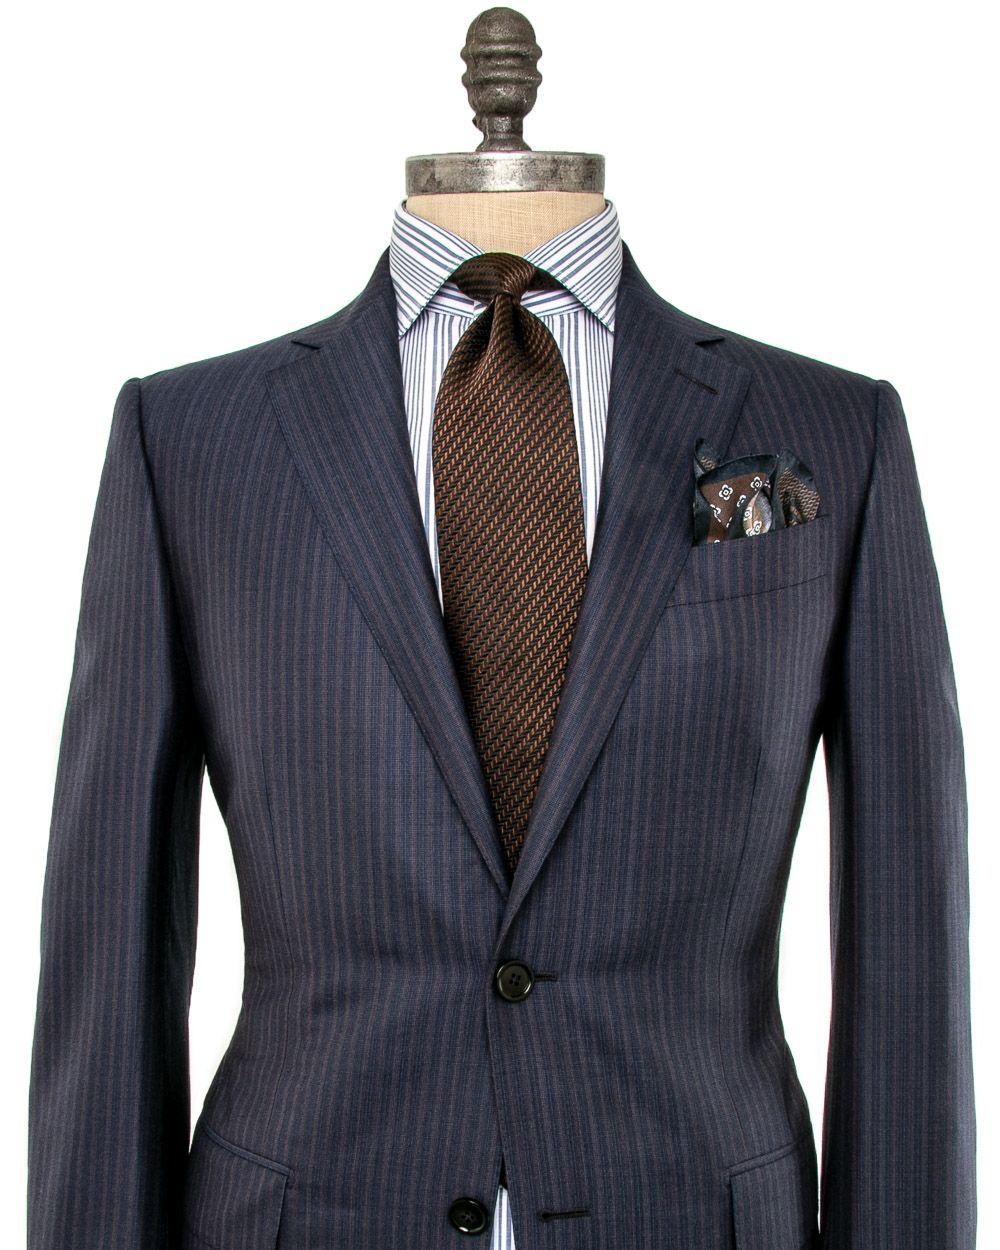 49d9ecfe860 Ermenegildo Zegna Navy and Brown Stripe Suit